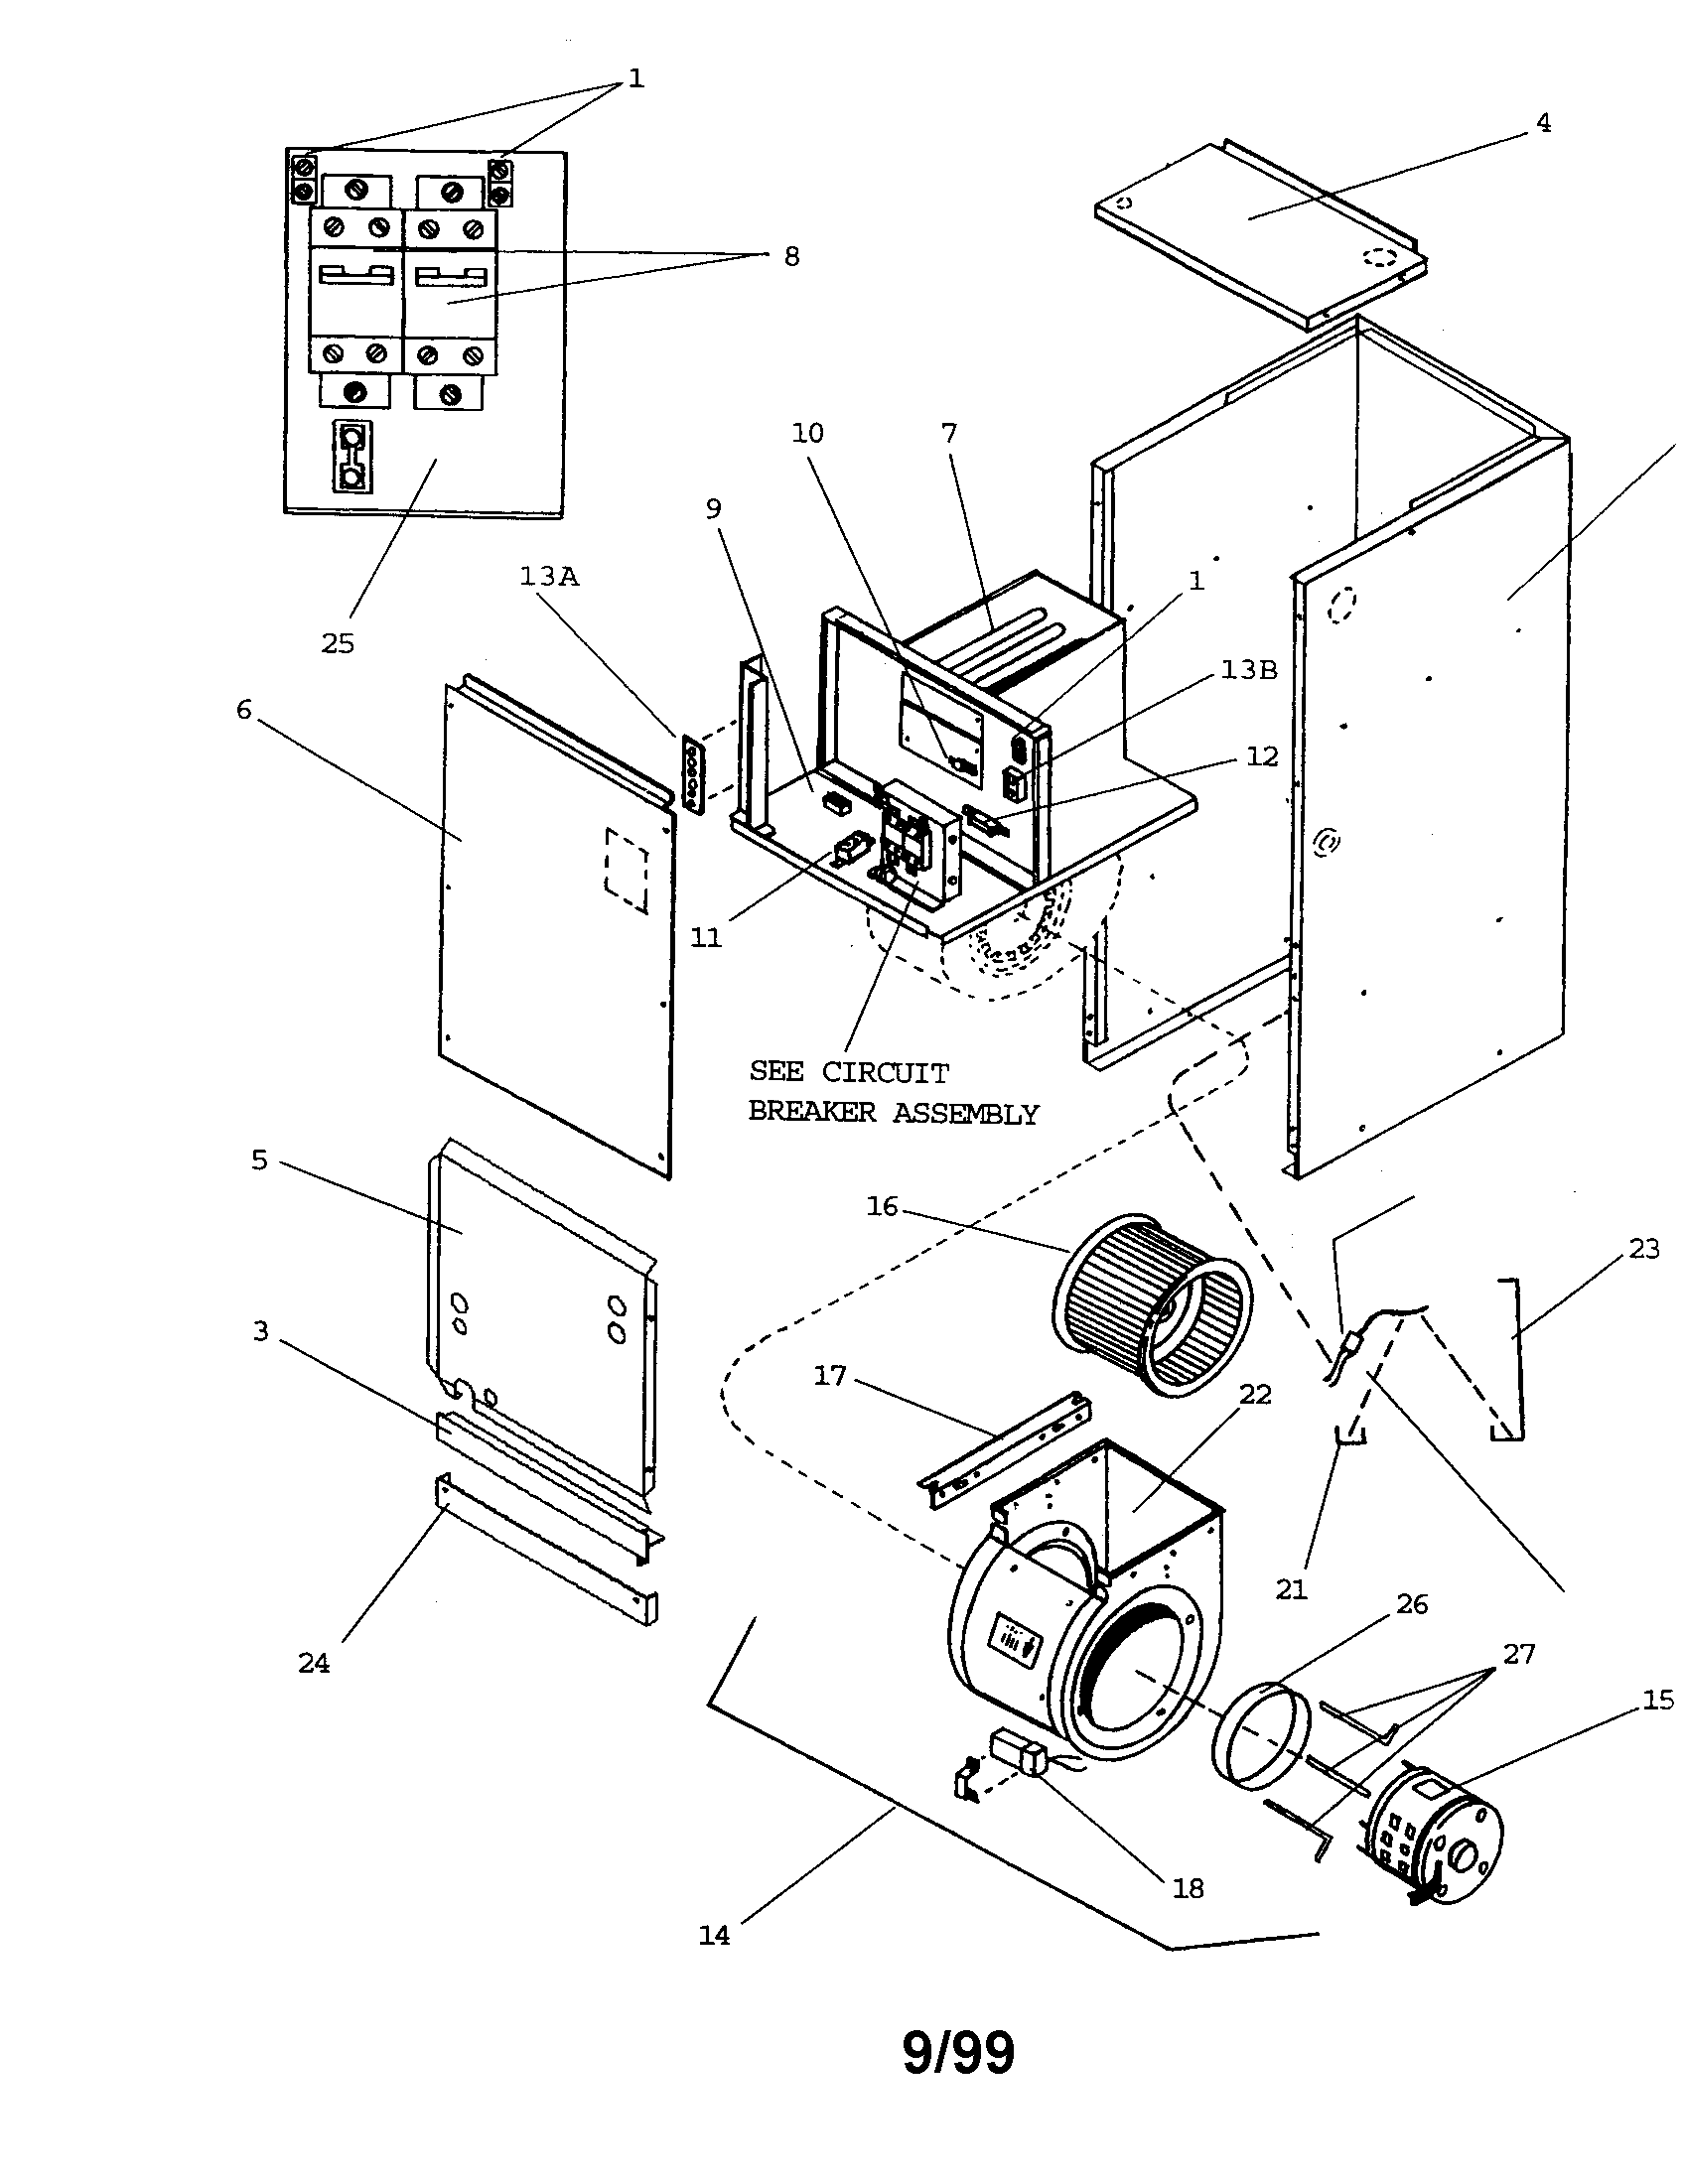 medium resolution of goodman air handler parts diagram wiring diagrams for trane air handler parts diagram air handler parts diagram